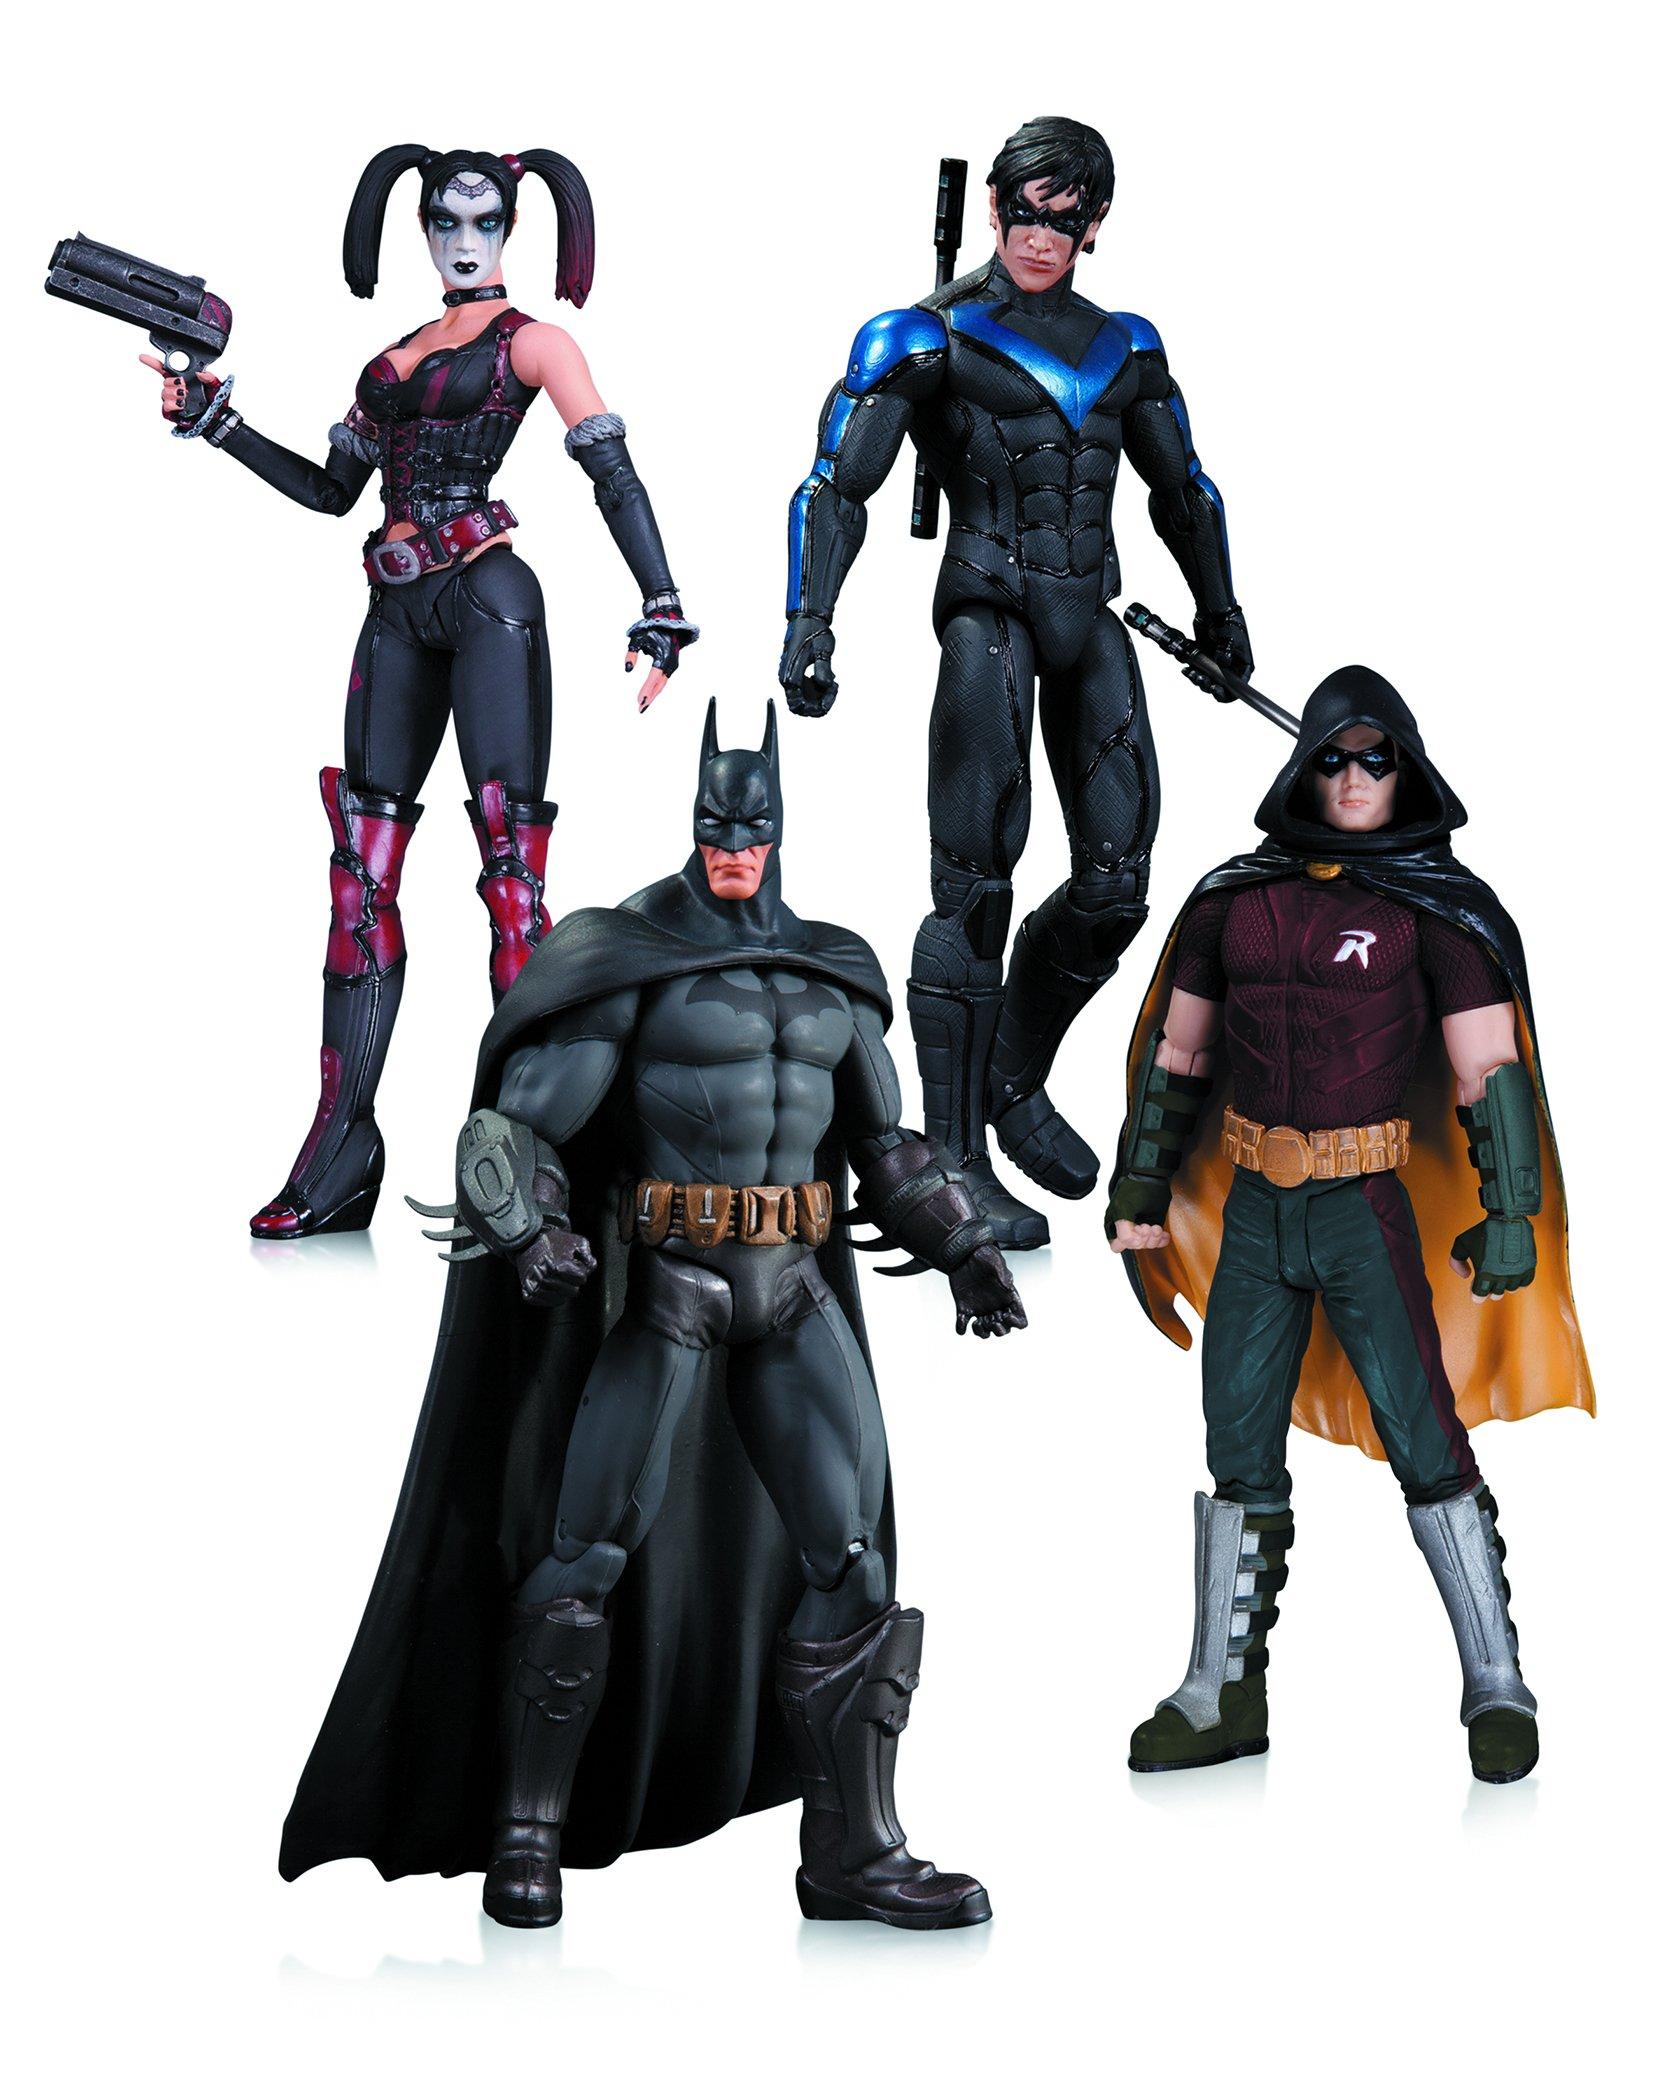 Arkham City Harley Quinn, Batman, Nightwing, and Robin 4 Pack